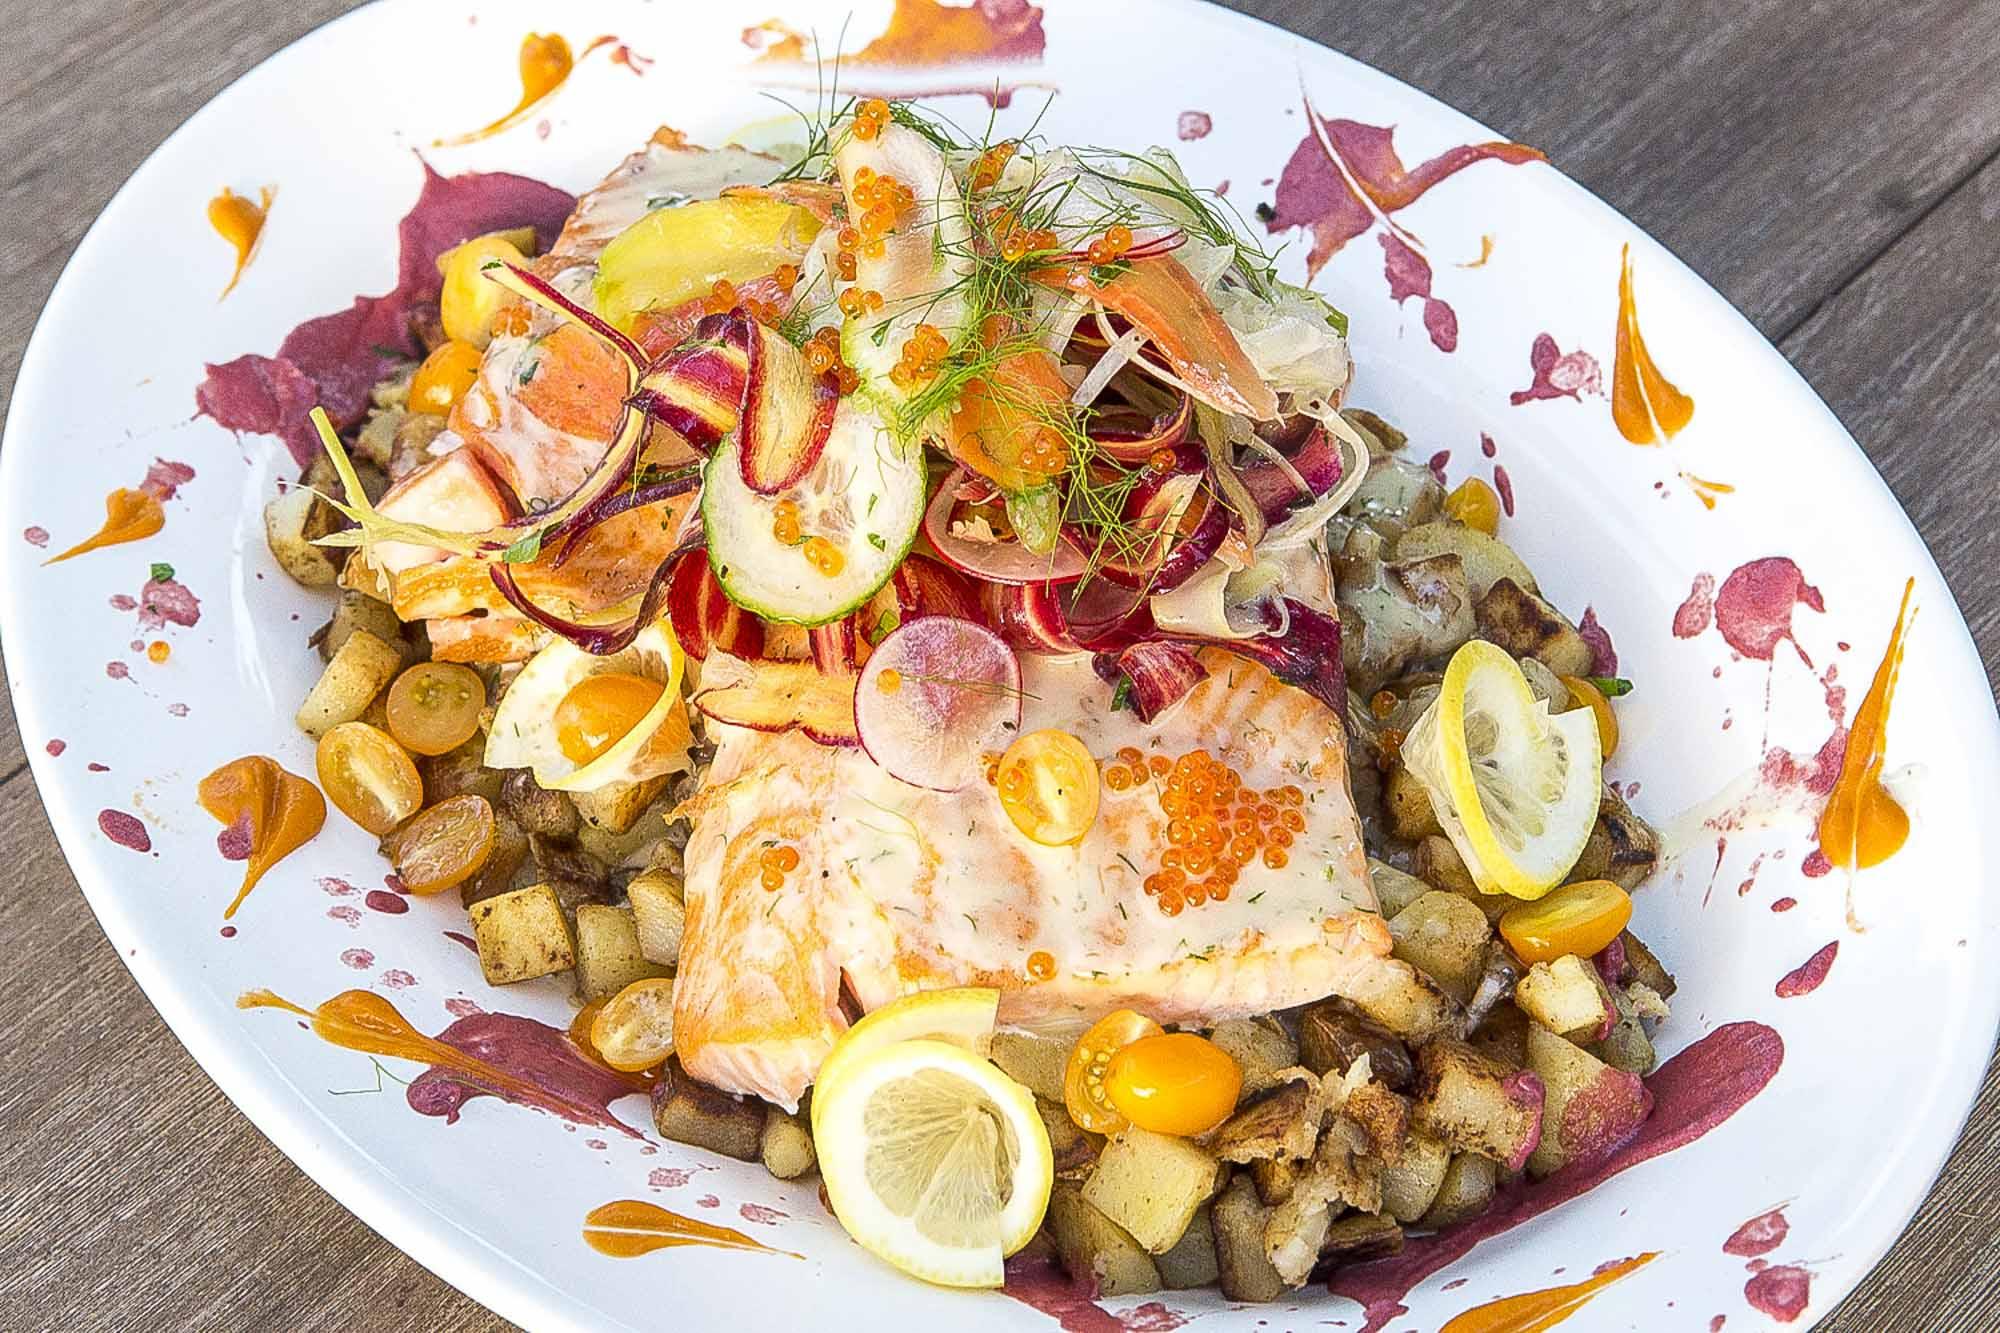 culinaryportfolio-4882.jpg